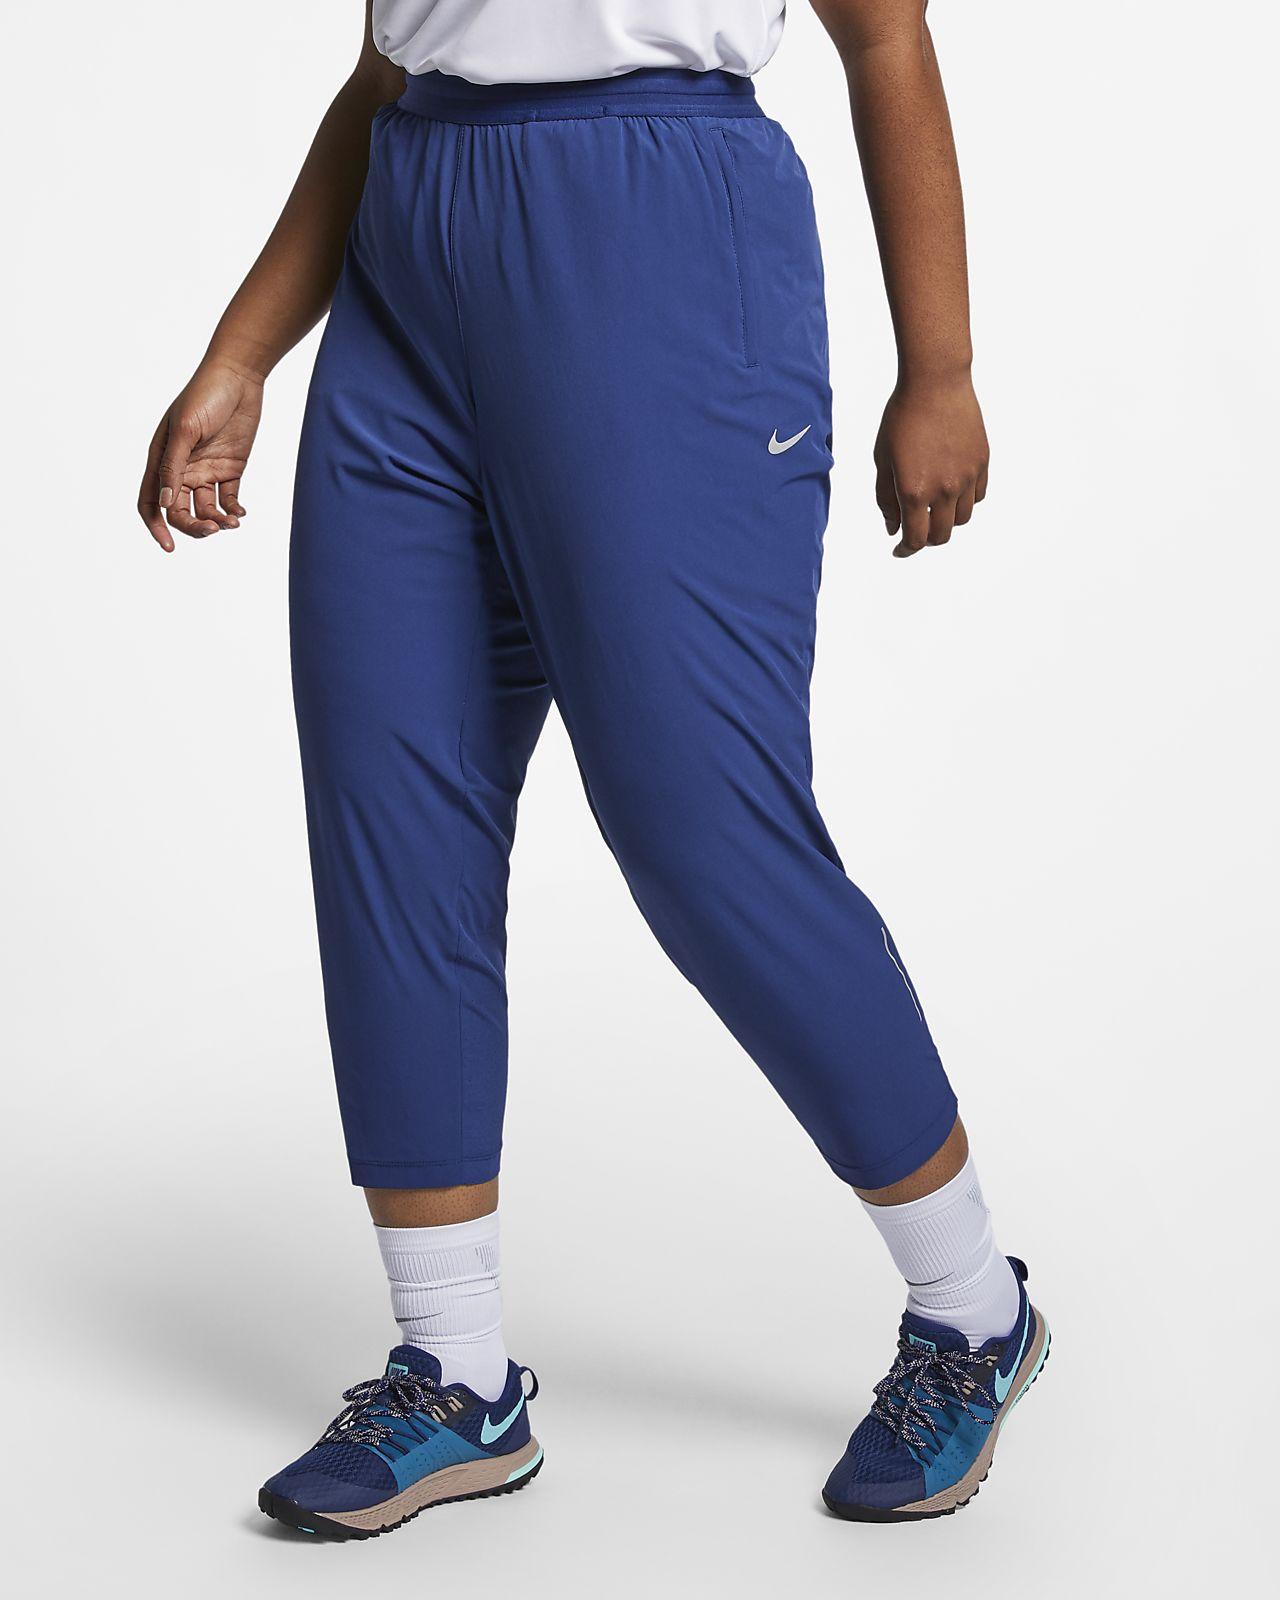 Pantalones de running de 7/8 para mujer Nike Essential (talla grande)